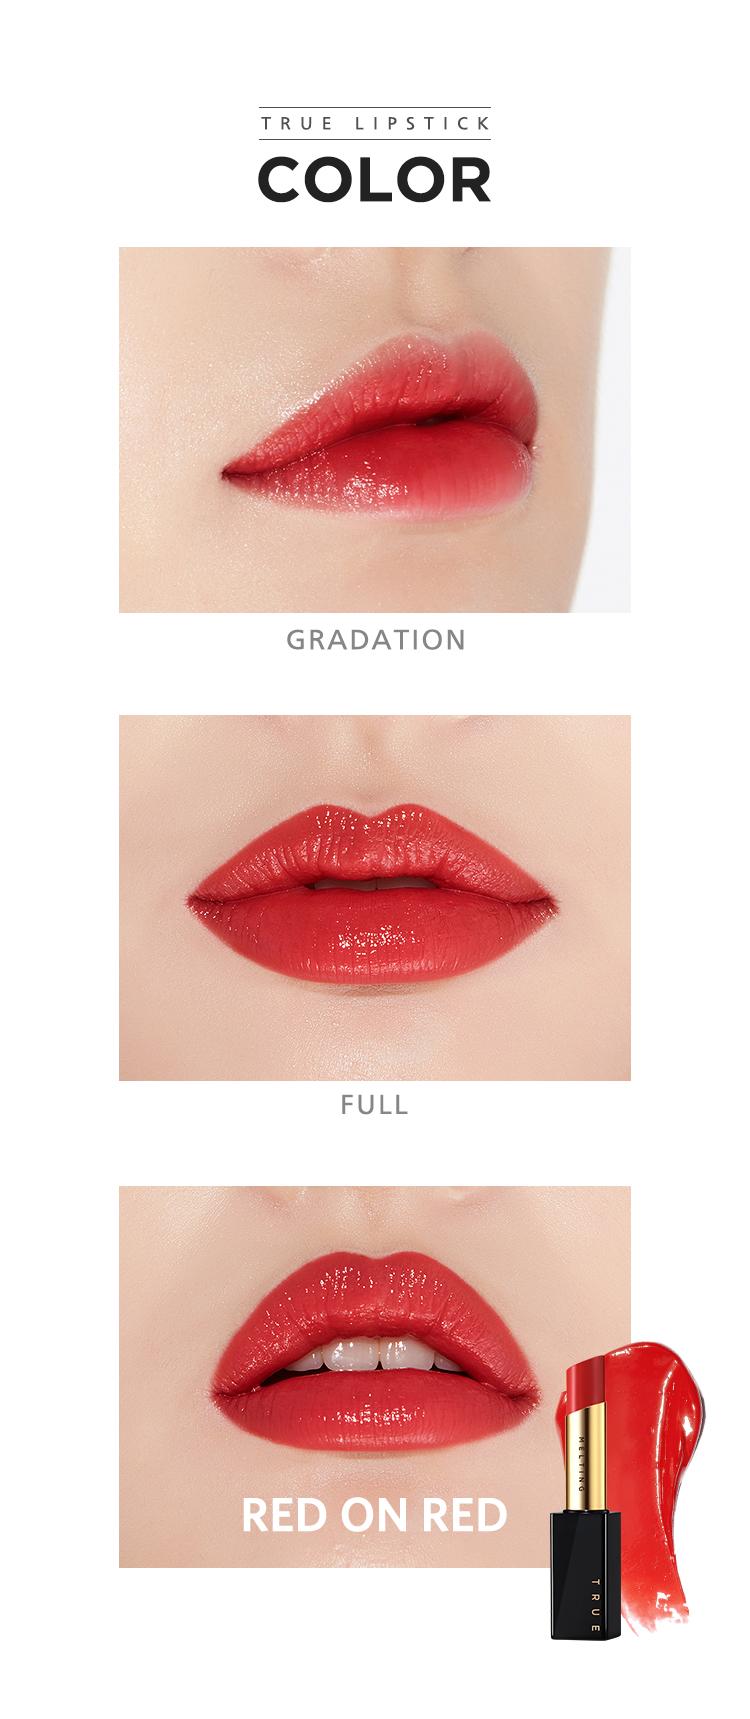 APIEU_True_Melting_Lipstick_bf_RD02_02.jpg